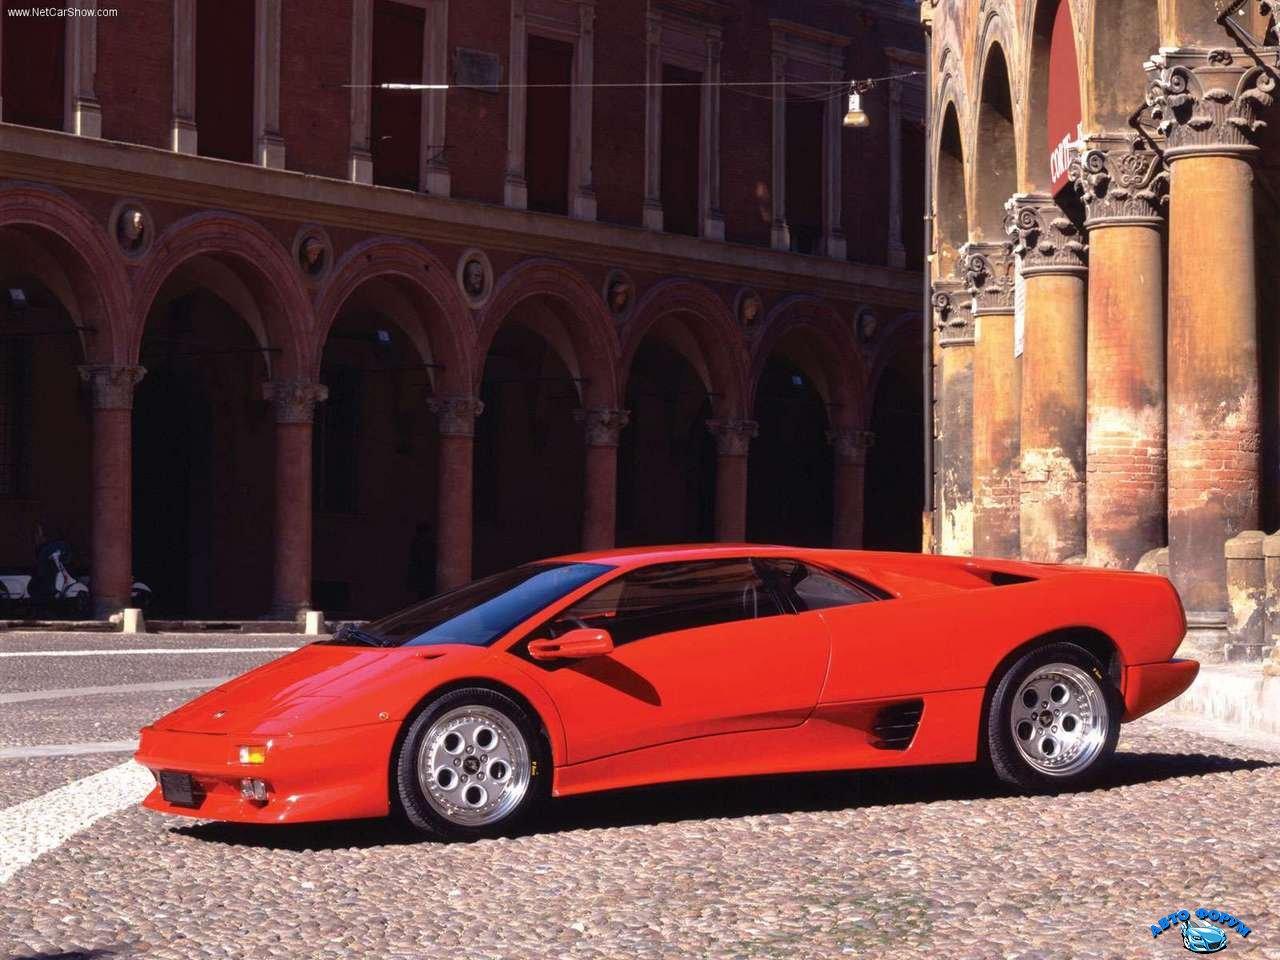 Lamborghini-Diablo_VT_1993_1280x960_wallpaper_02.jpg